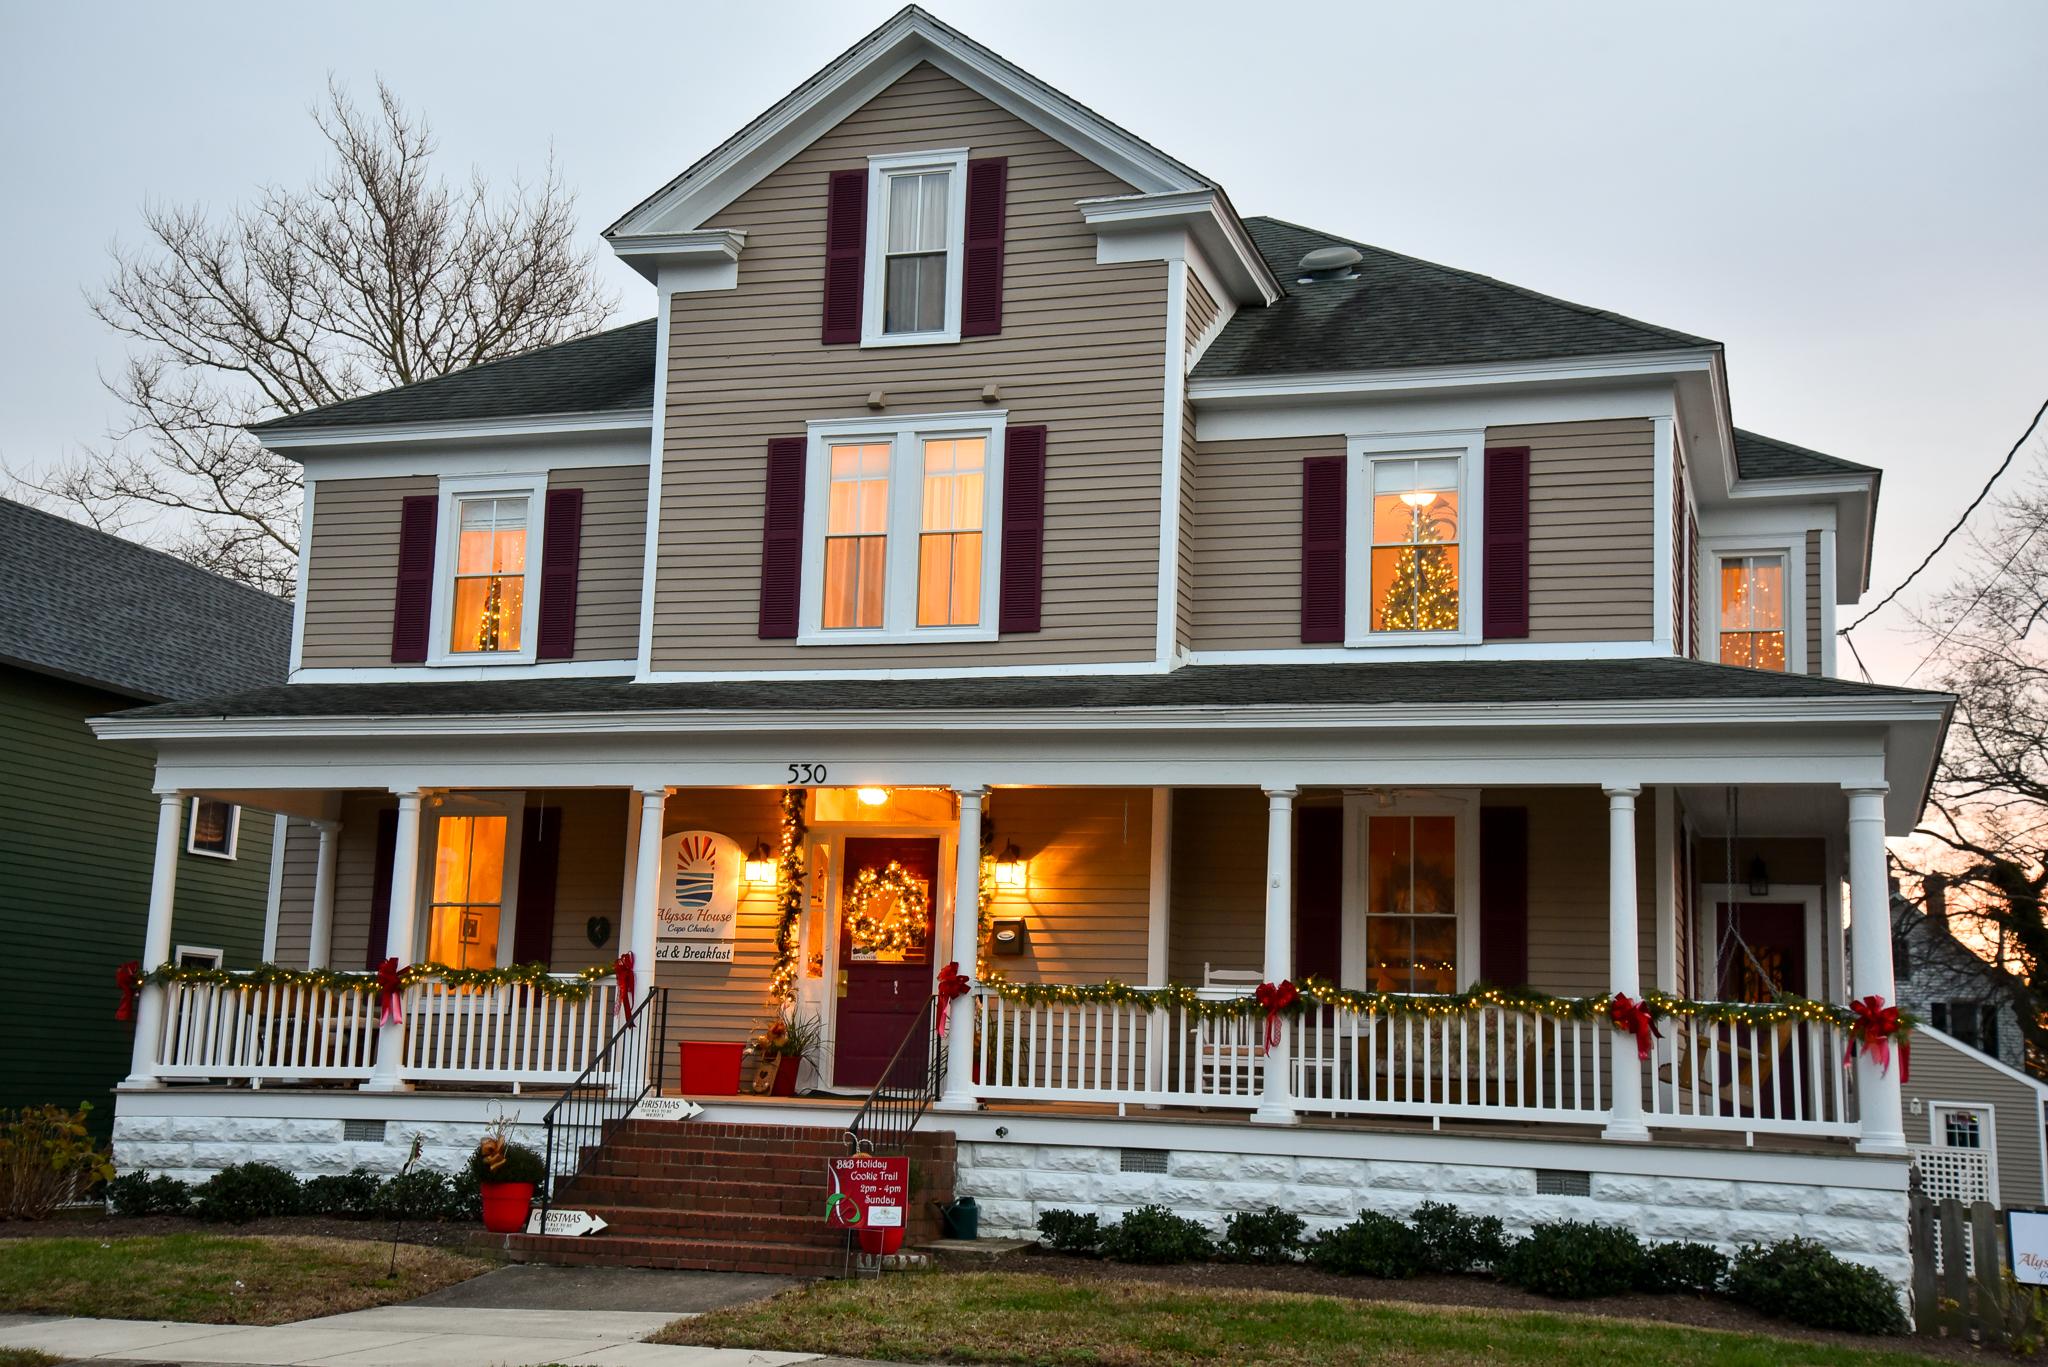 Alyssa House Bed and Breakfast - Eastern Shore of Virginia ...